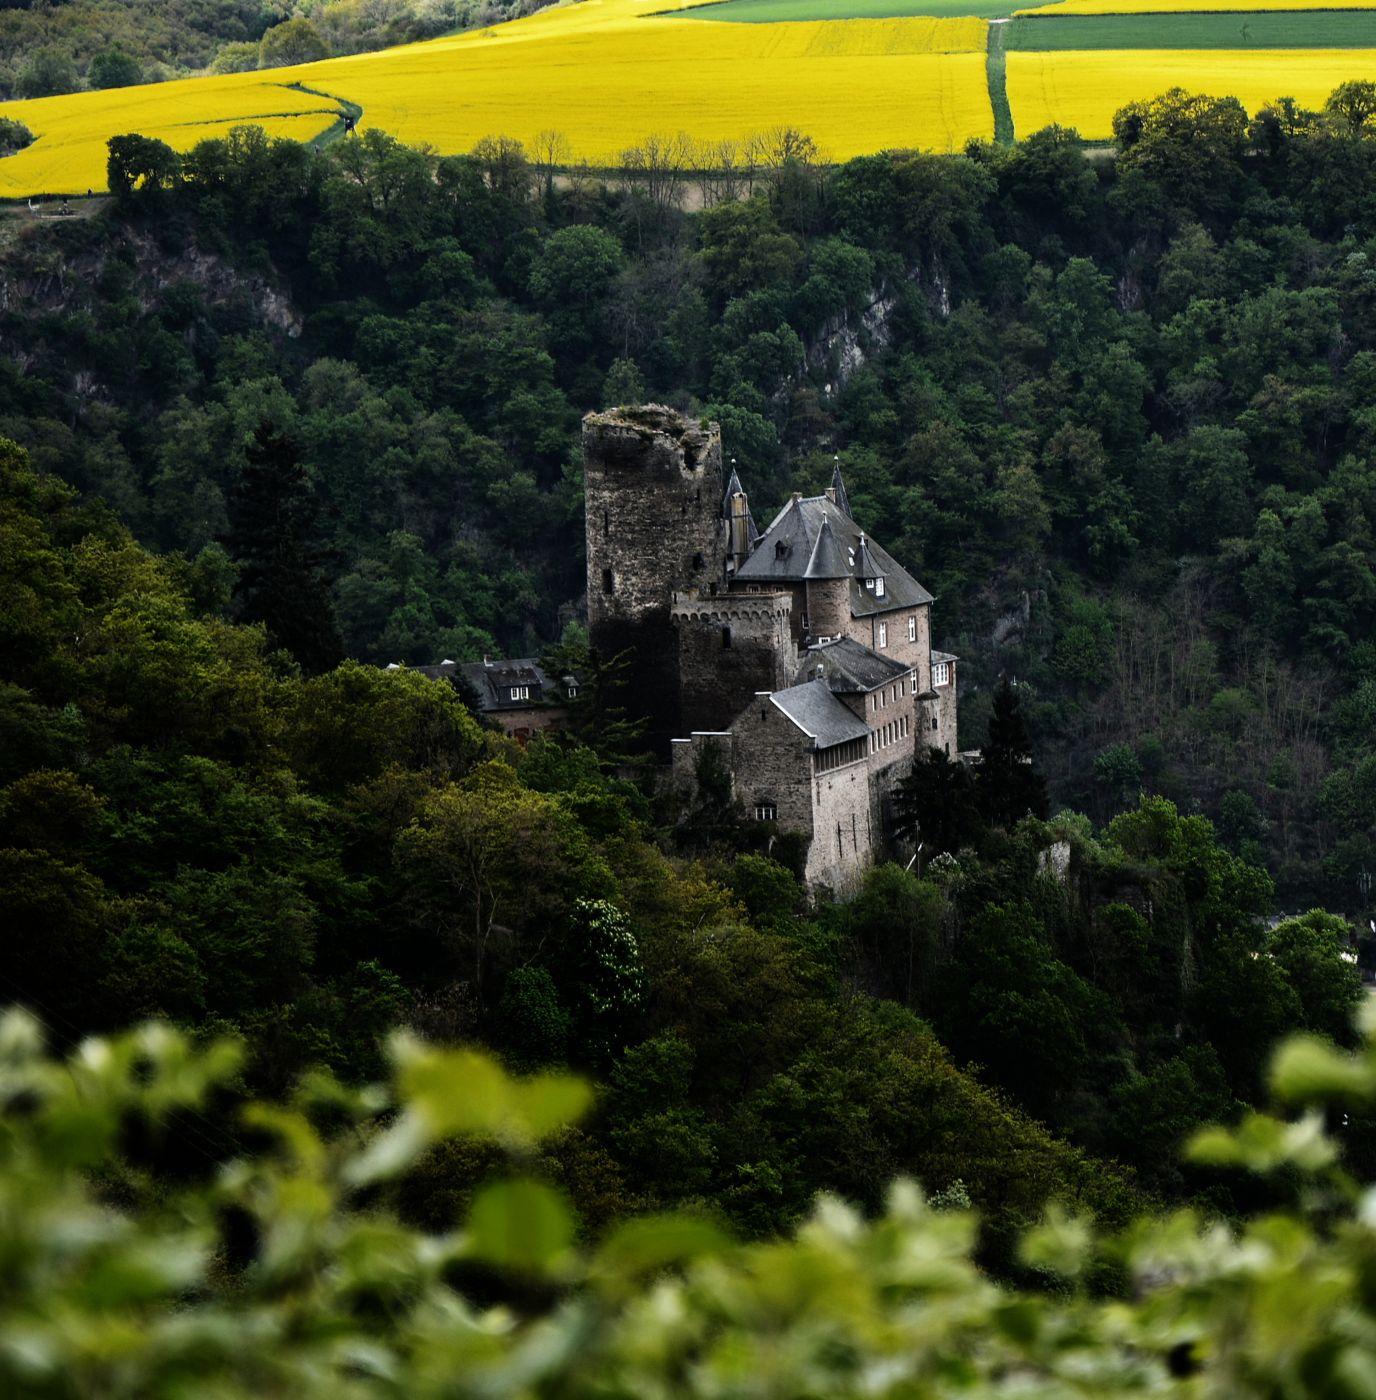 Katz Castle, Rhine River, Germany